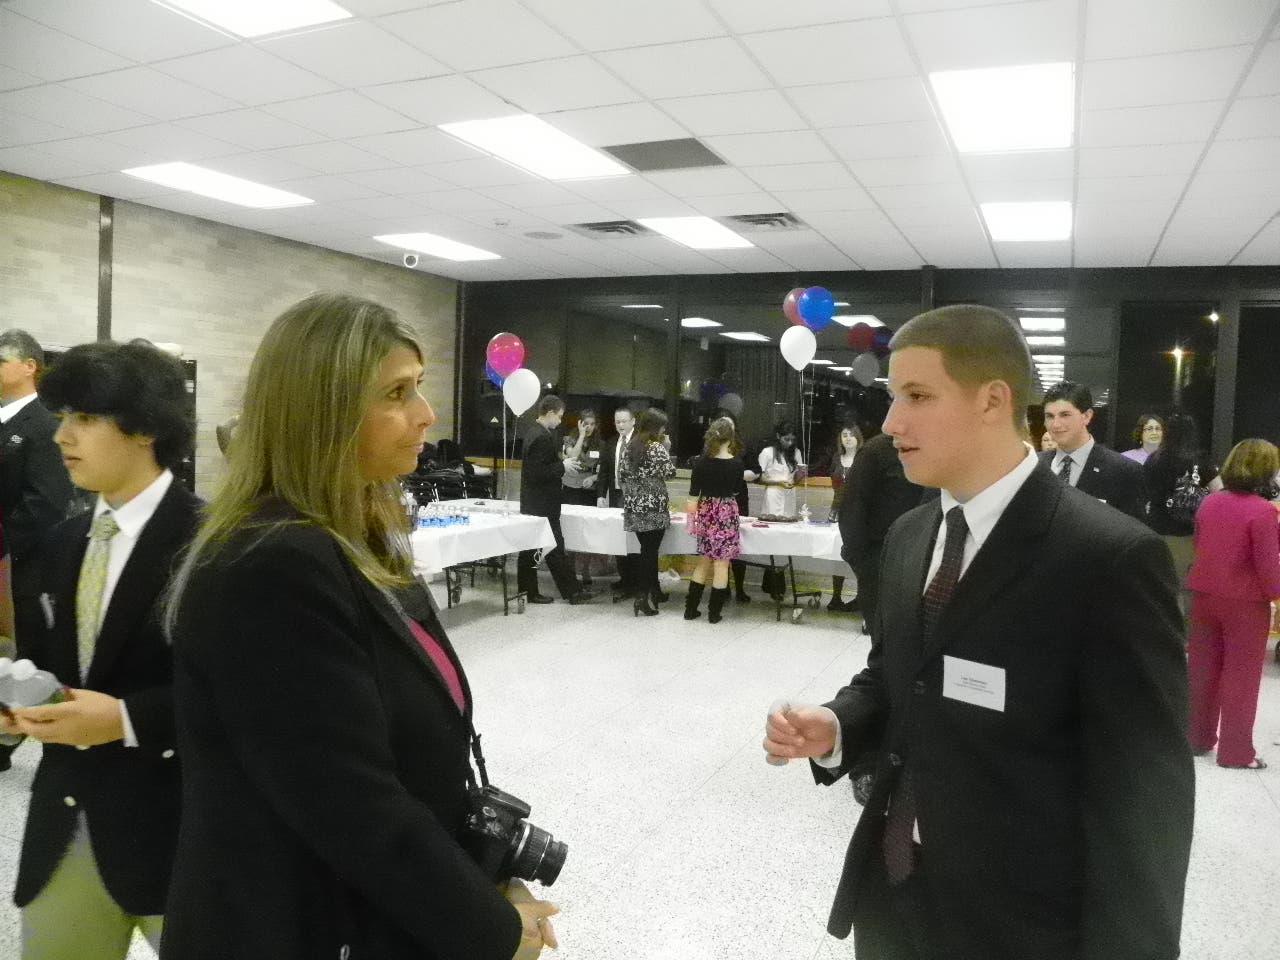 District Hosts Meet the Candidates Night | Half Hollow Hills